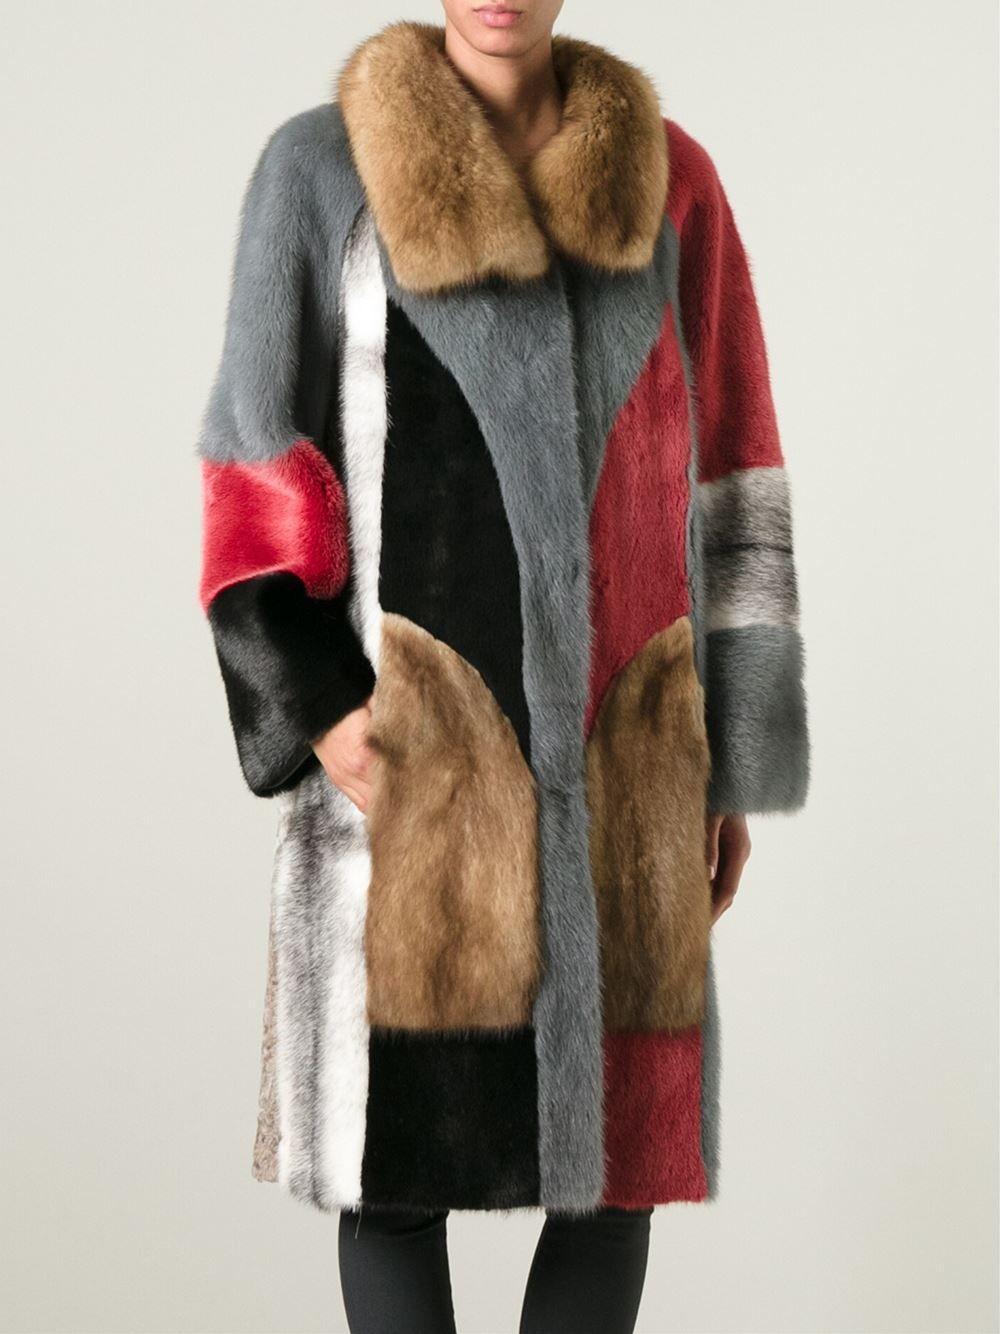 Shop Offer Cheap Price oversize fur coat - Multicolour Liska Recommend Online Outlet Latest KSNfnr5T